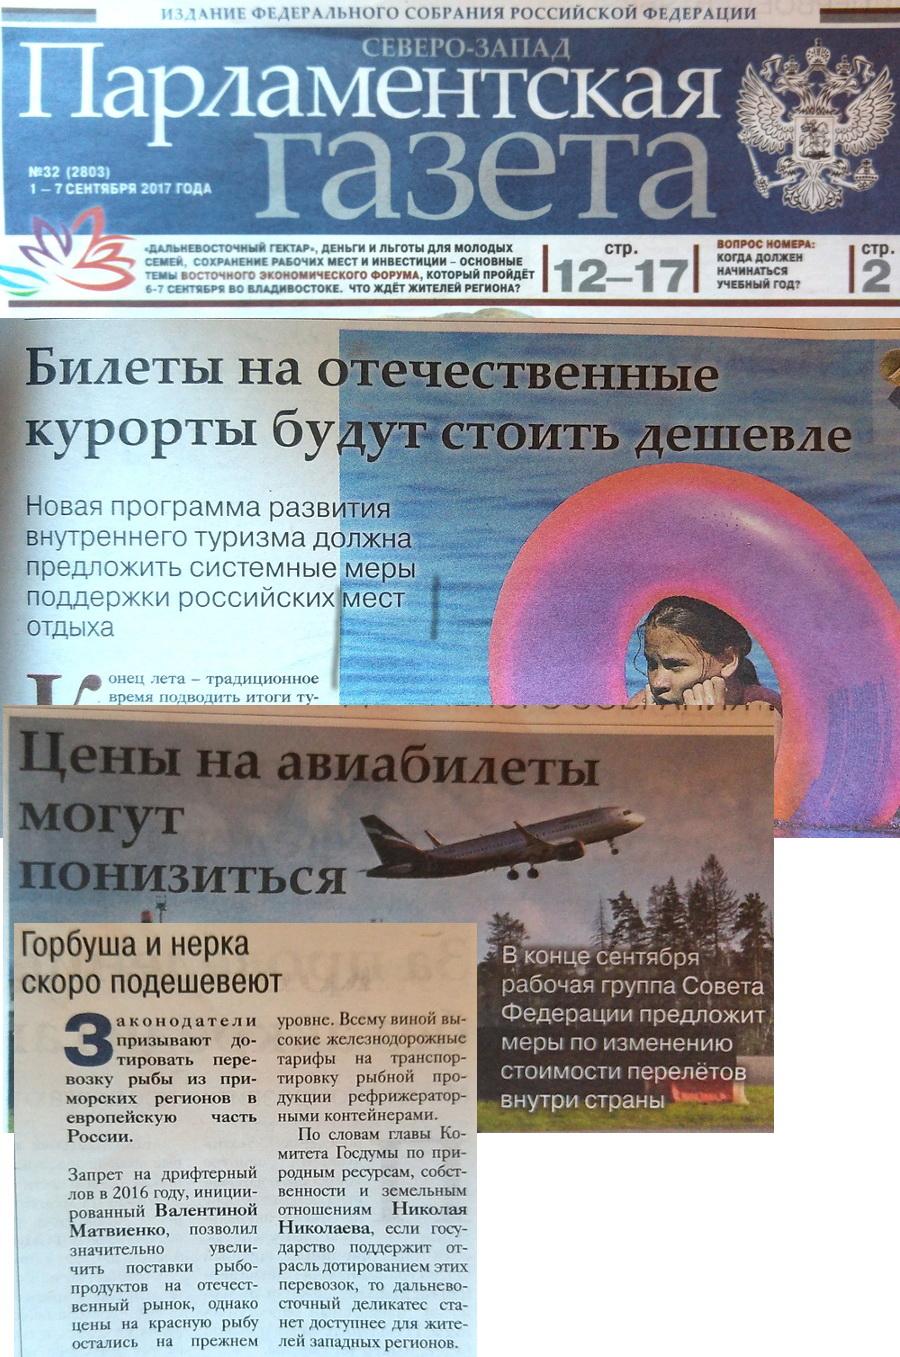 Парламентская газета, 32/2017. Все подешевеет.